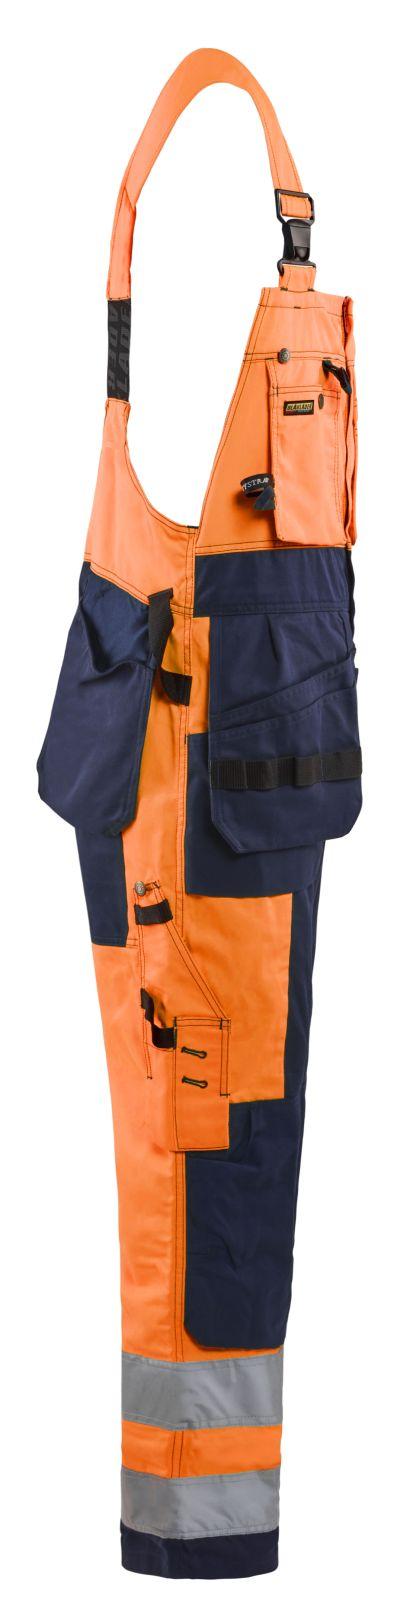 Blaklader Amerikaanse overalls 26031860 High Vis oranje-marineblauw(5389)